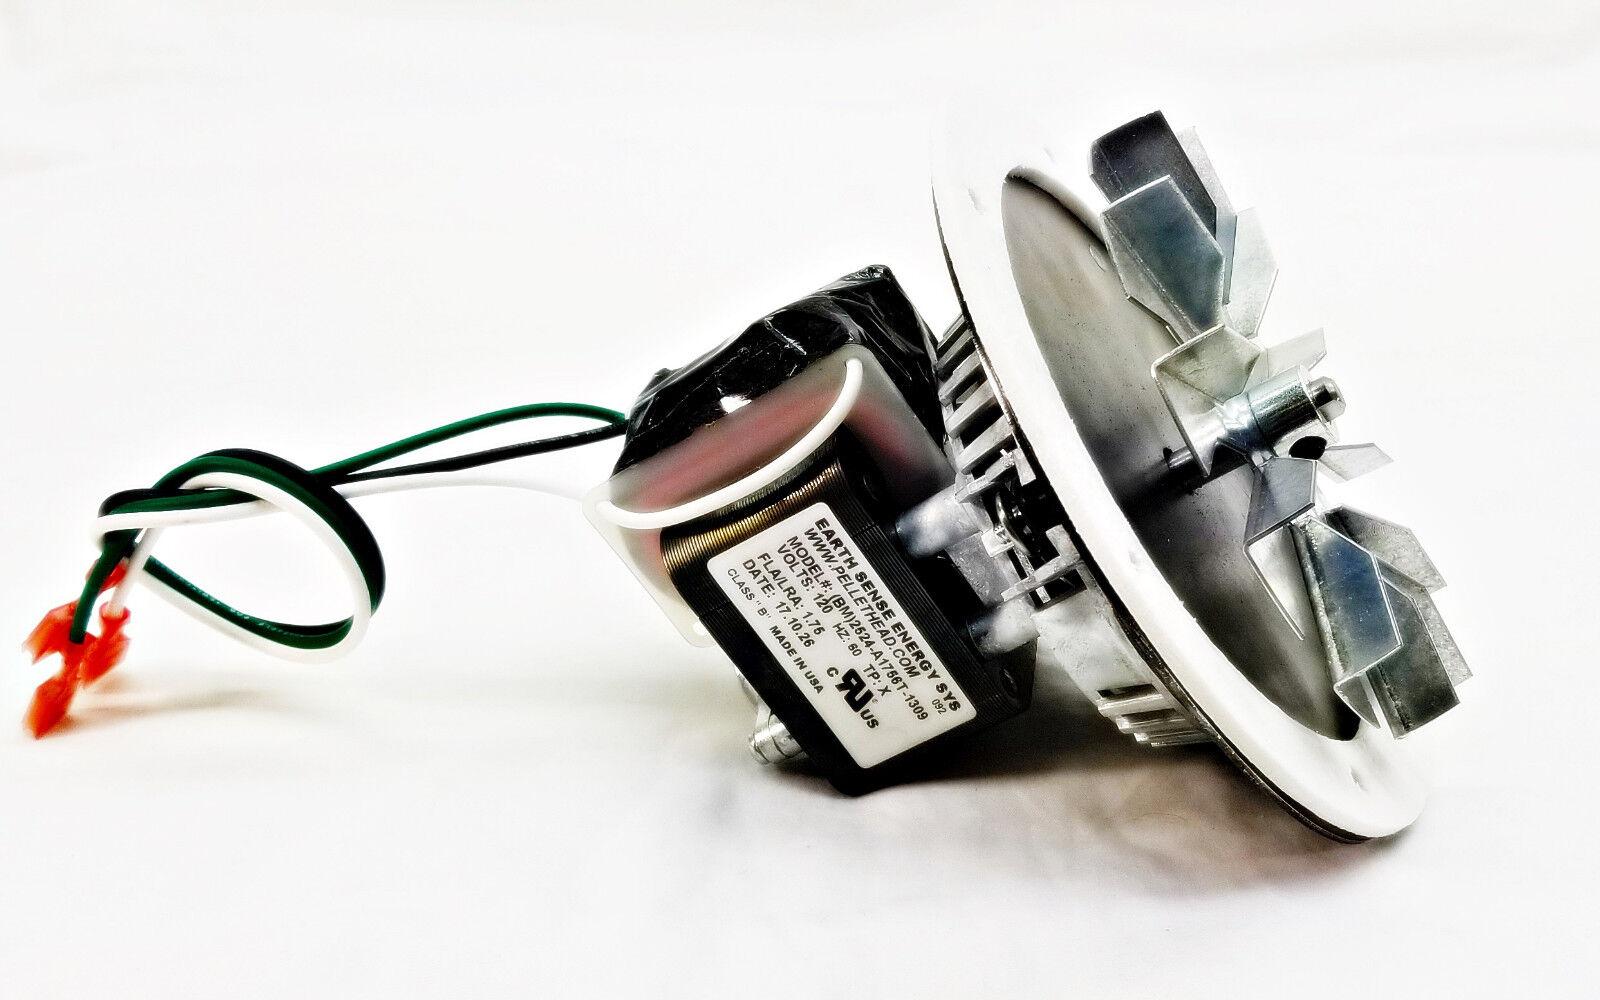 Regency GFI55, Combustion Exhaust Motor Fan + 4 3 4  - GF55-002, AMP-UNIVCOMBKIT